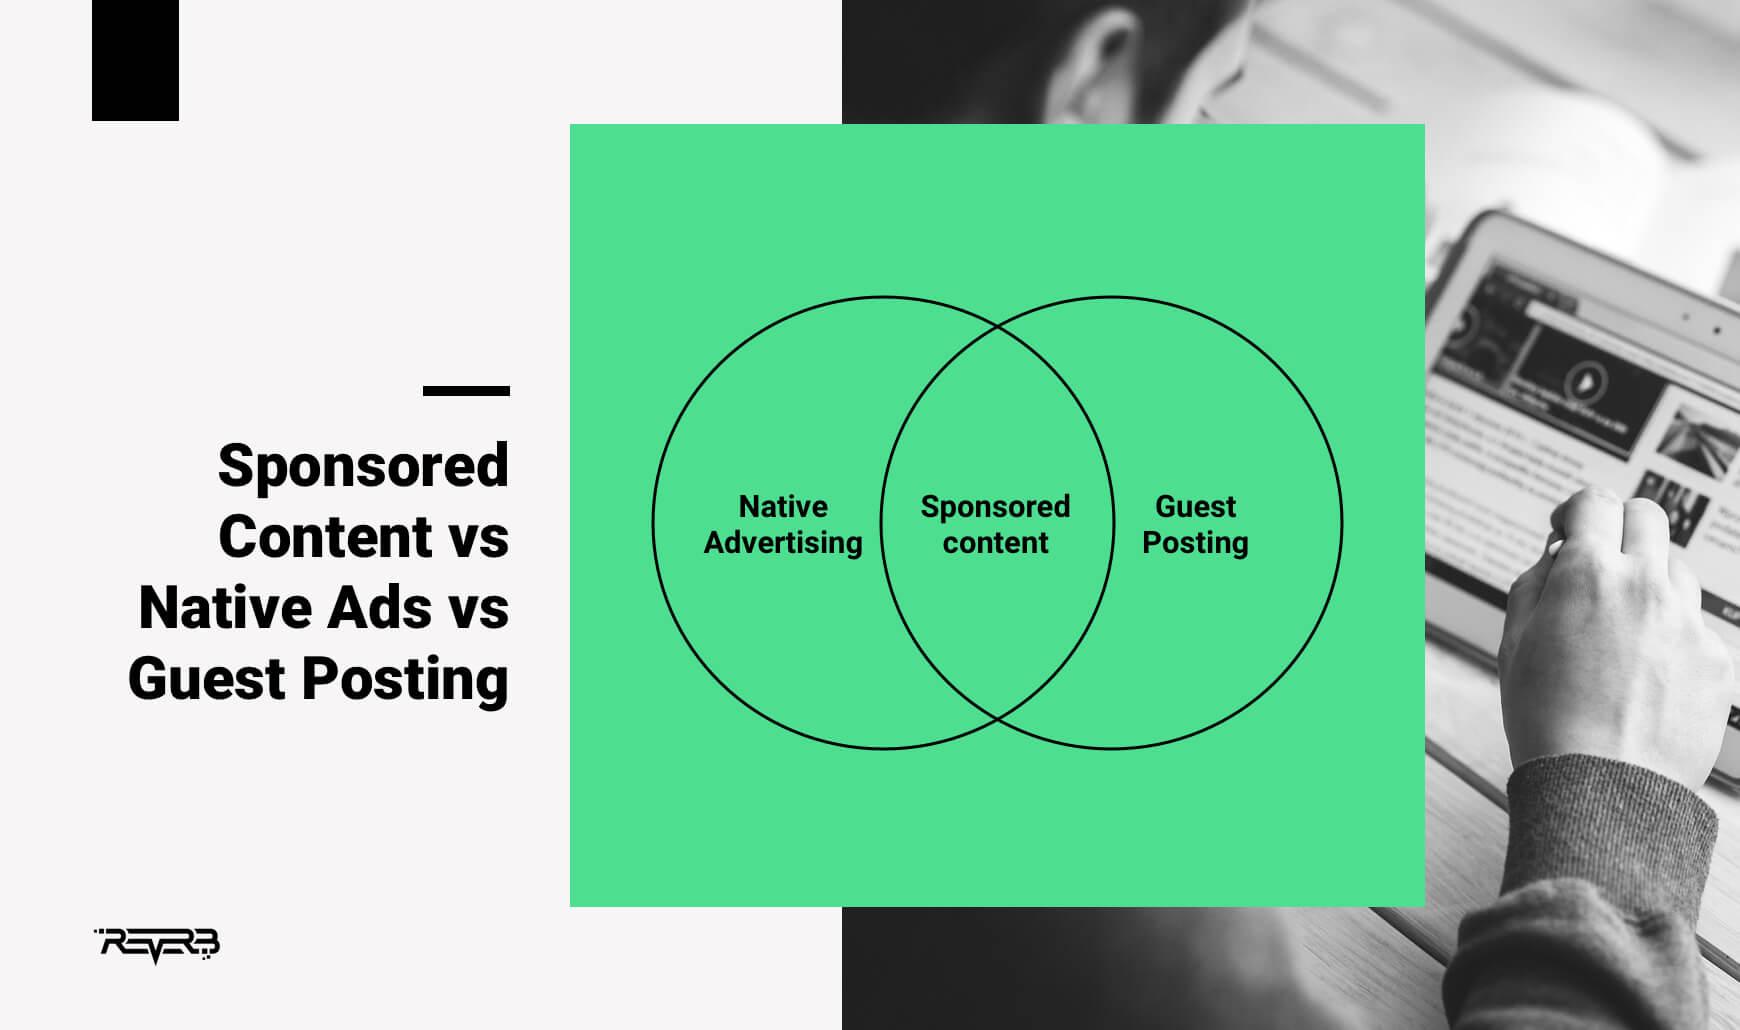 sponsored content vs native ads